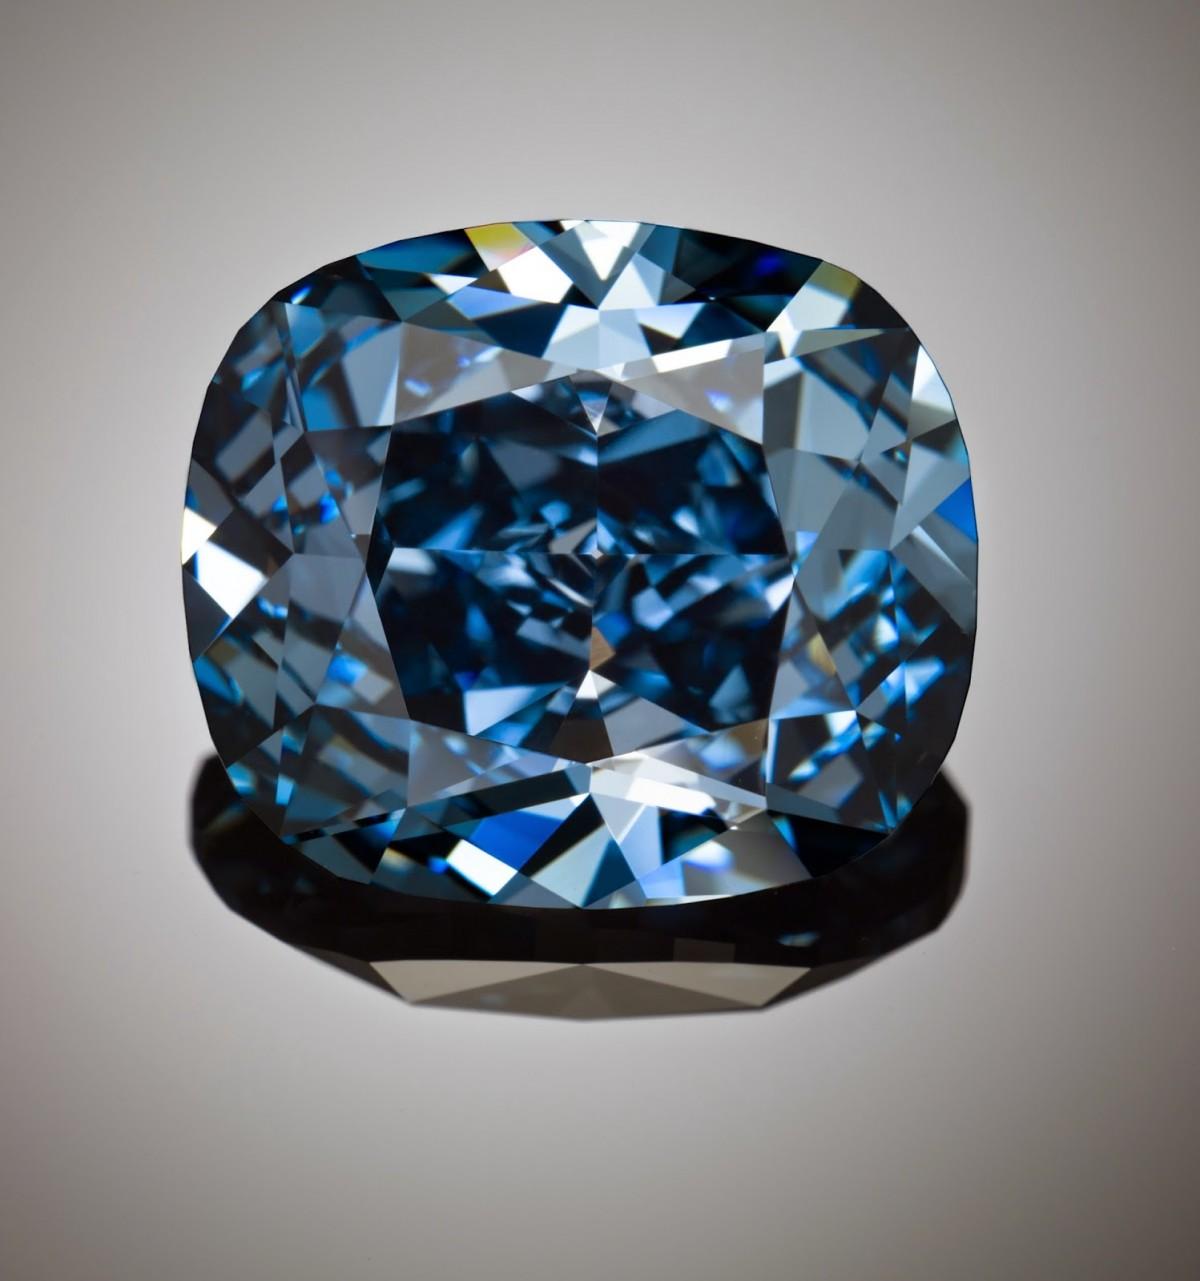 Blue moon diamond reddiam